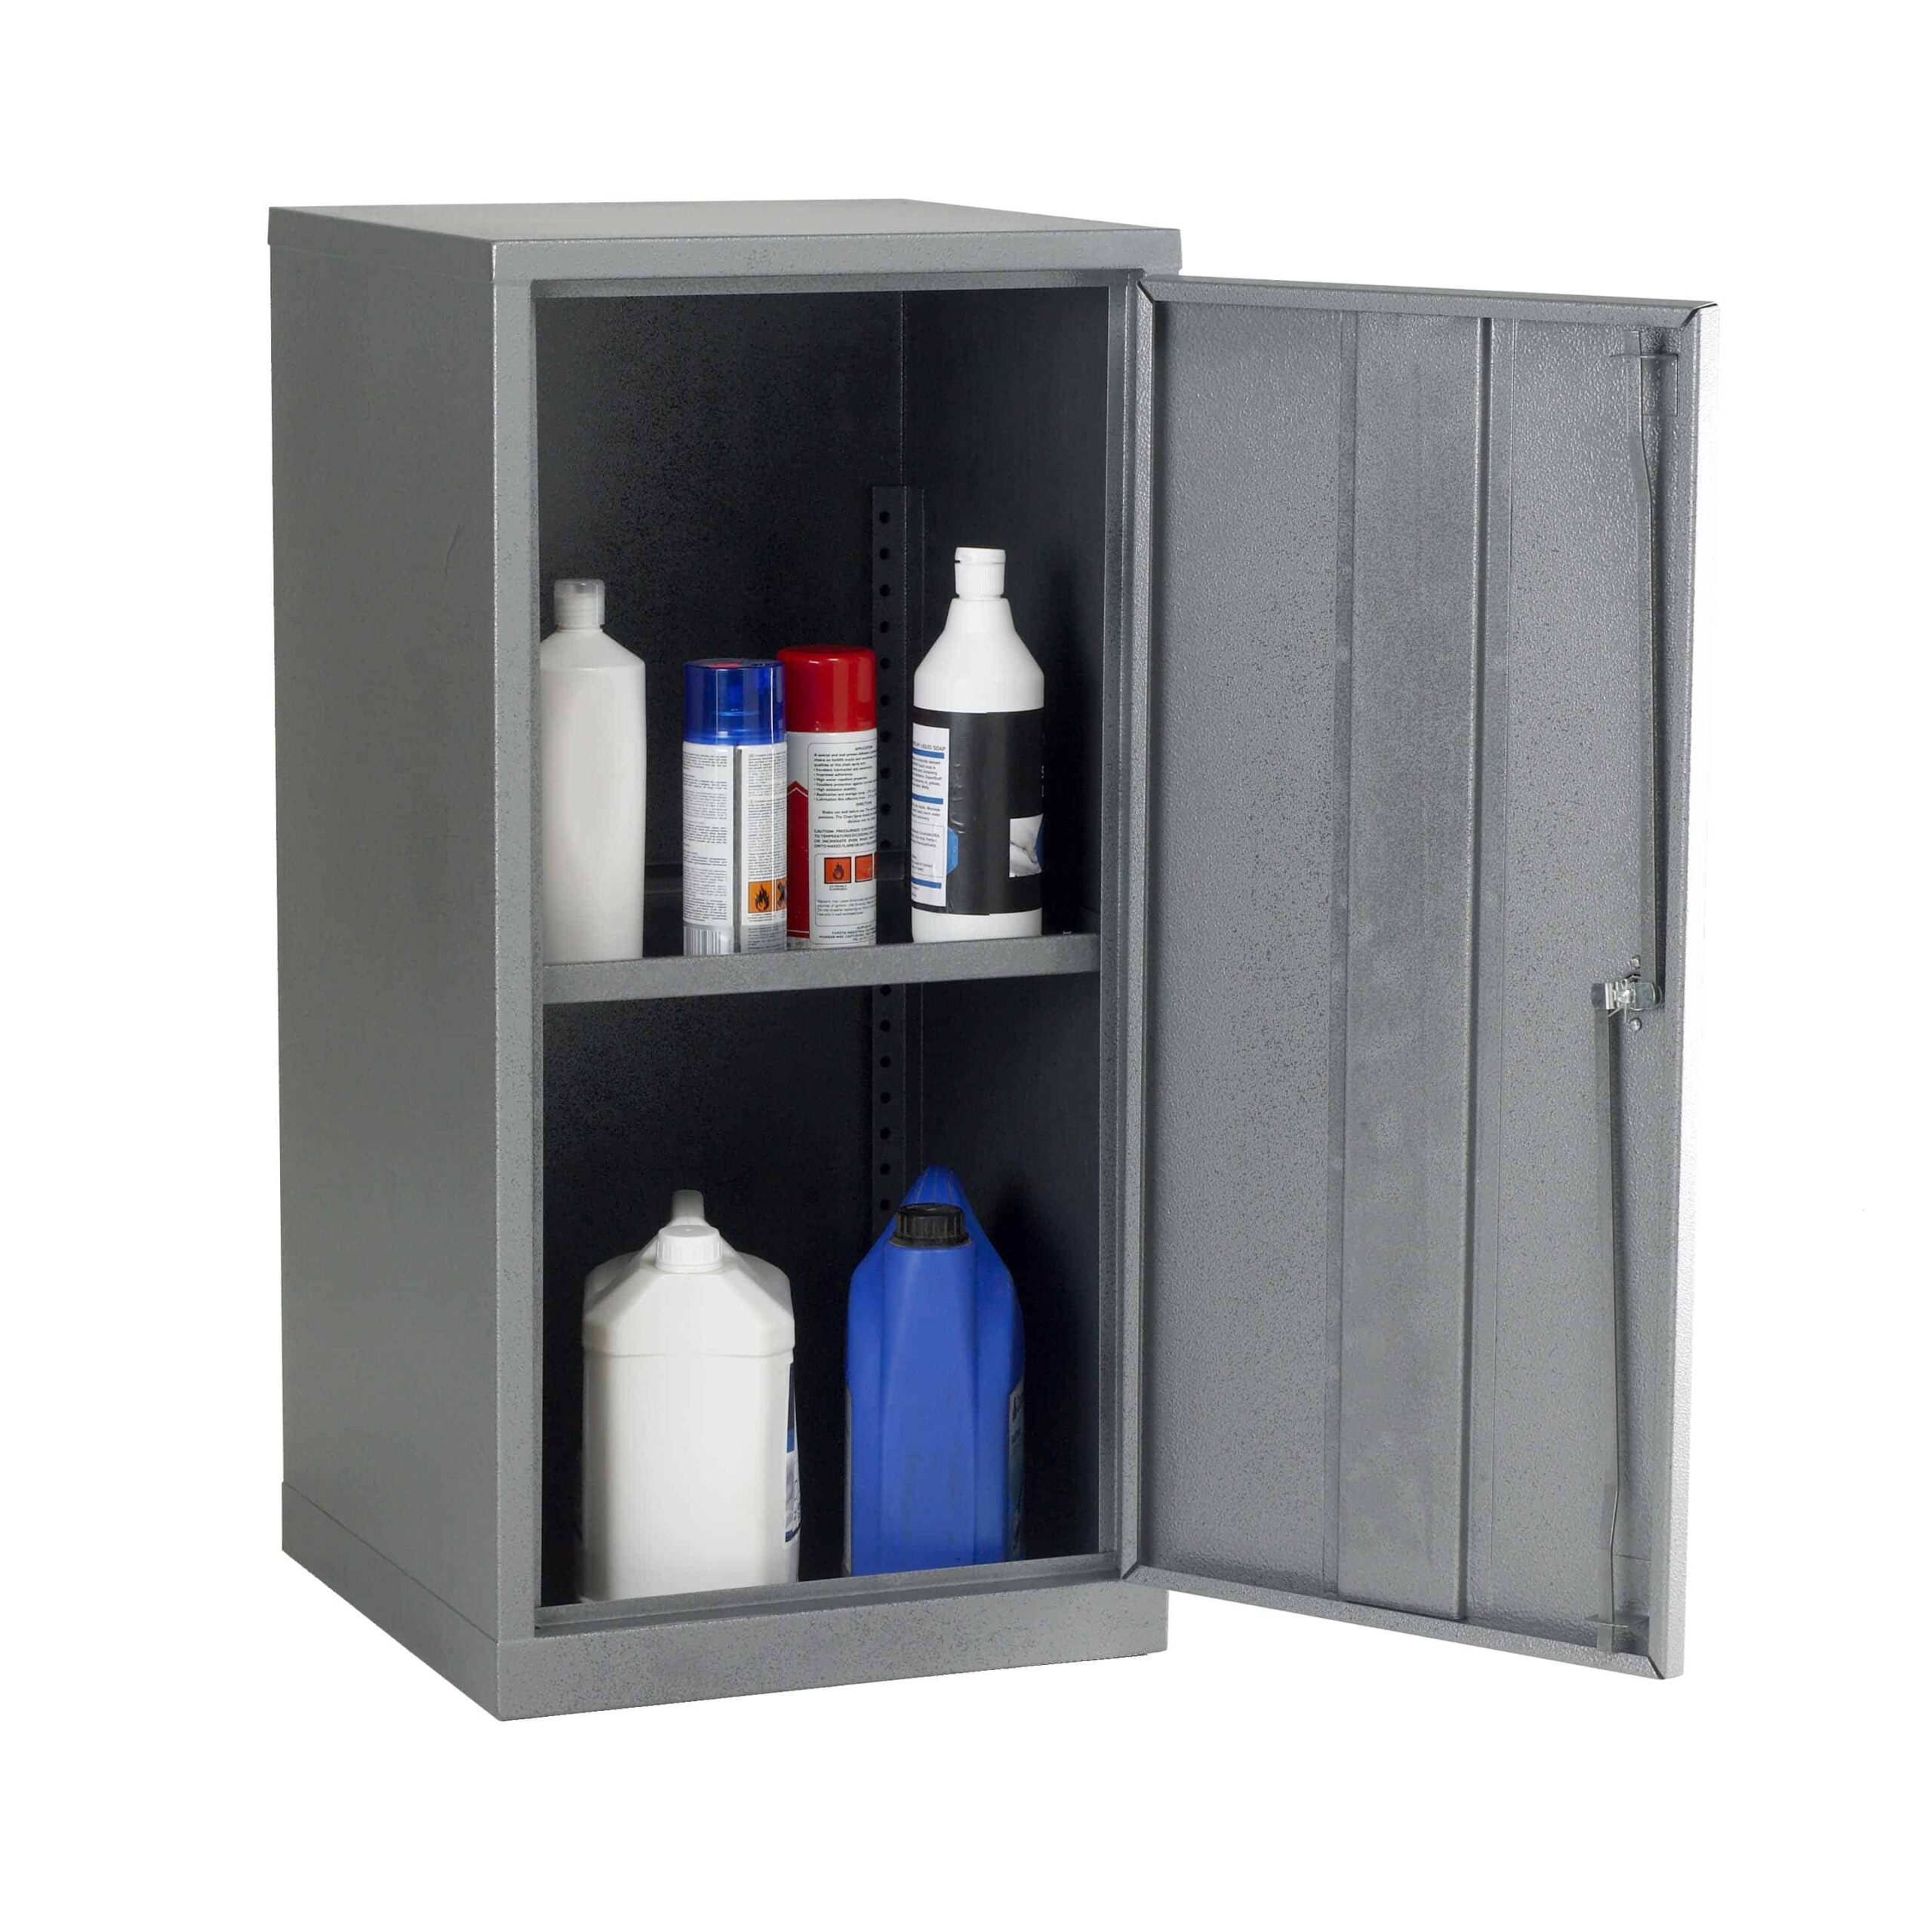 SU02C COSHH Storage Cabinets